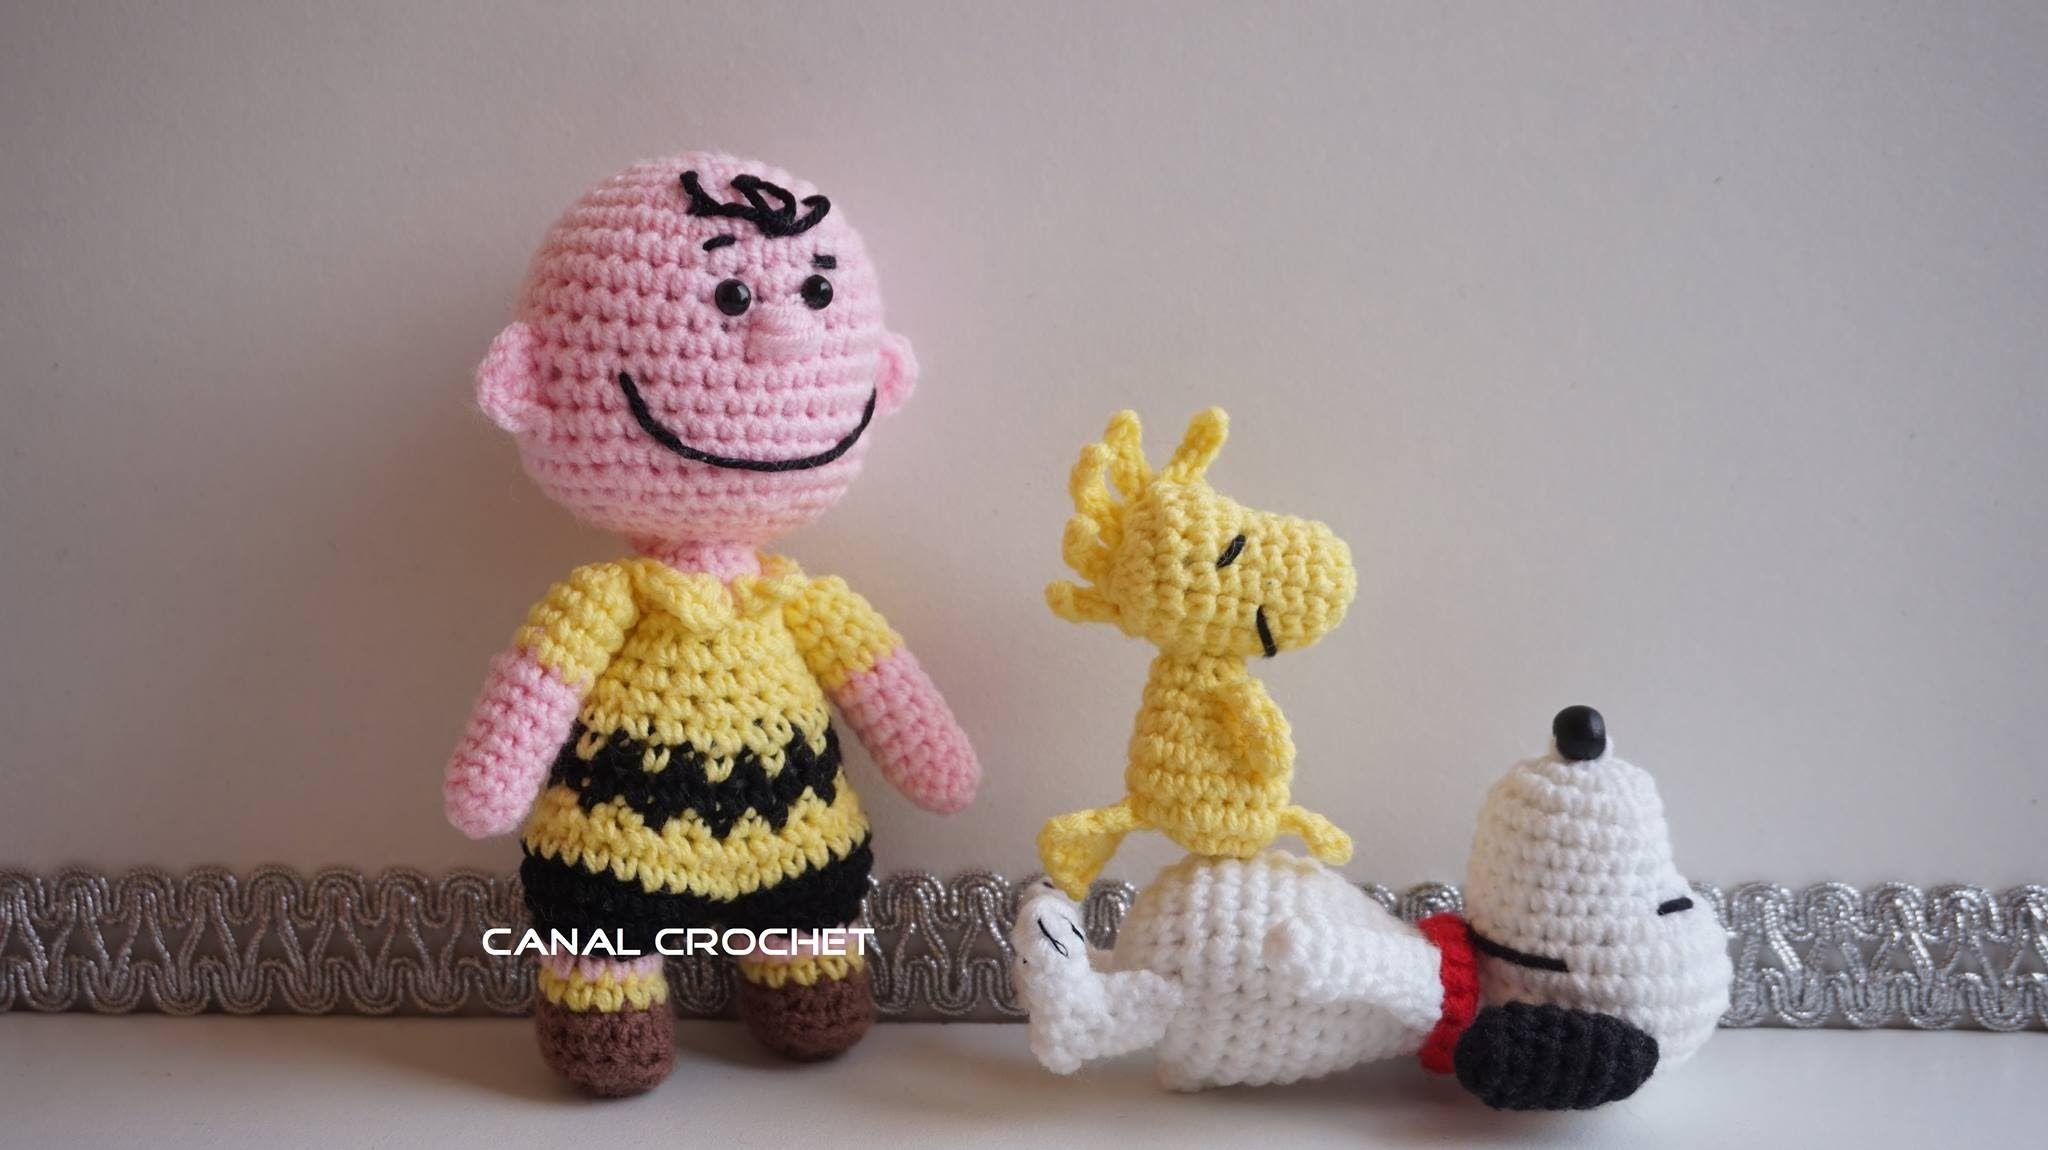 Snoopy Easy Amigurumi Pattern : Https: www.facebook.com canal crochet 1166416096719575 http